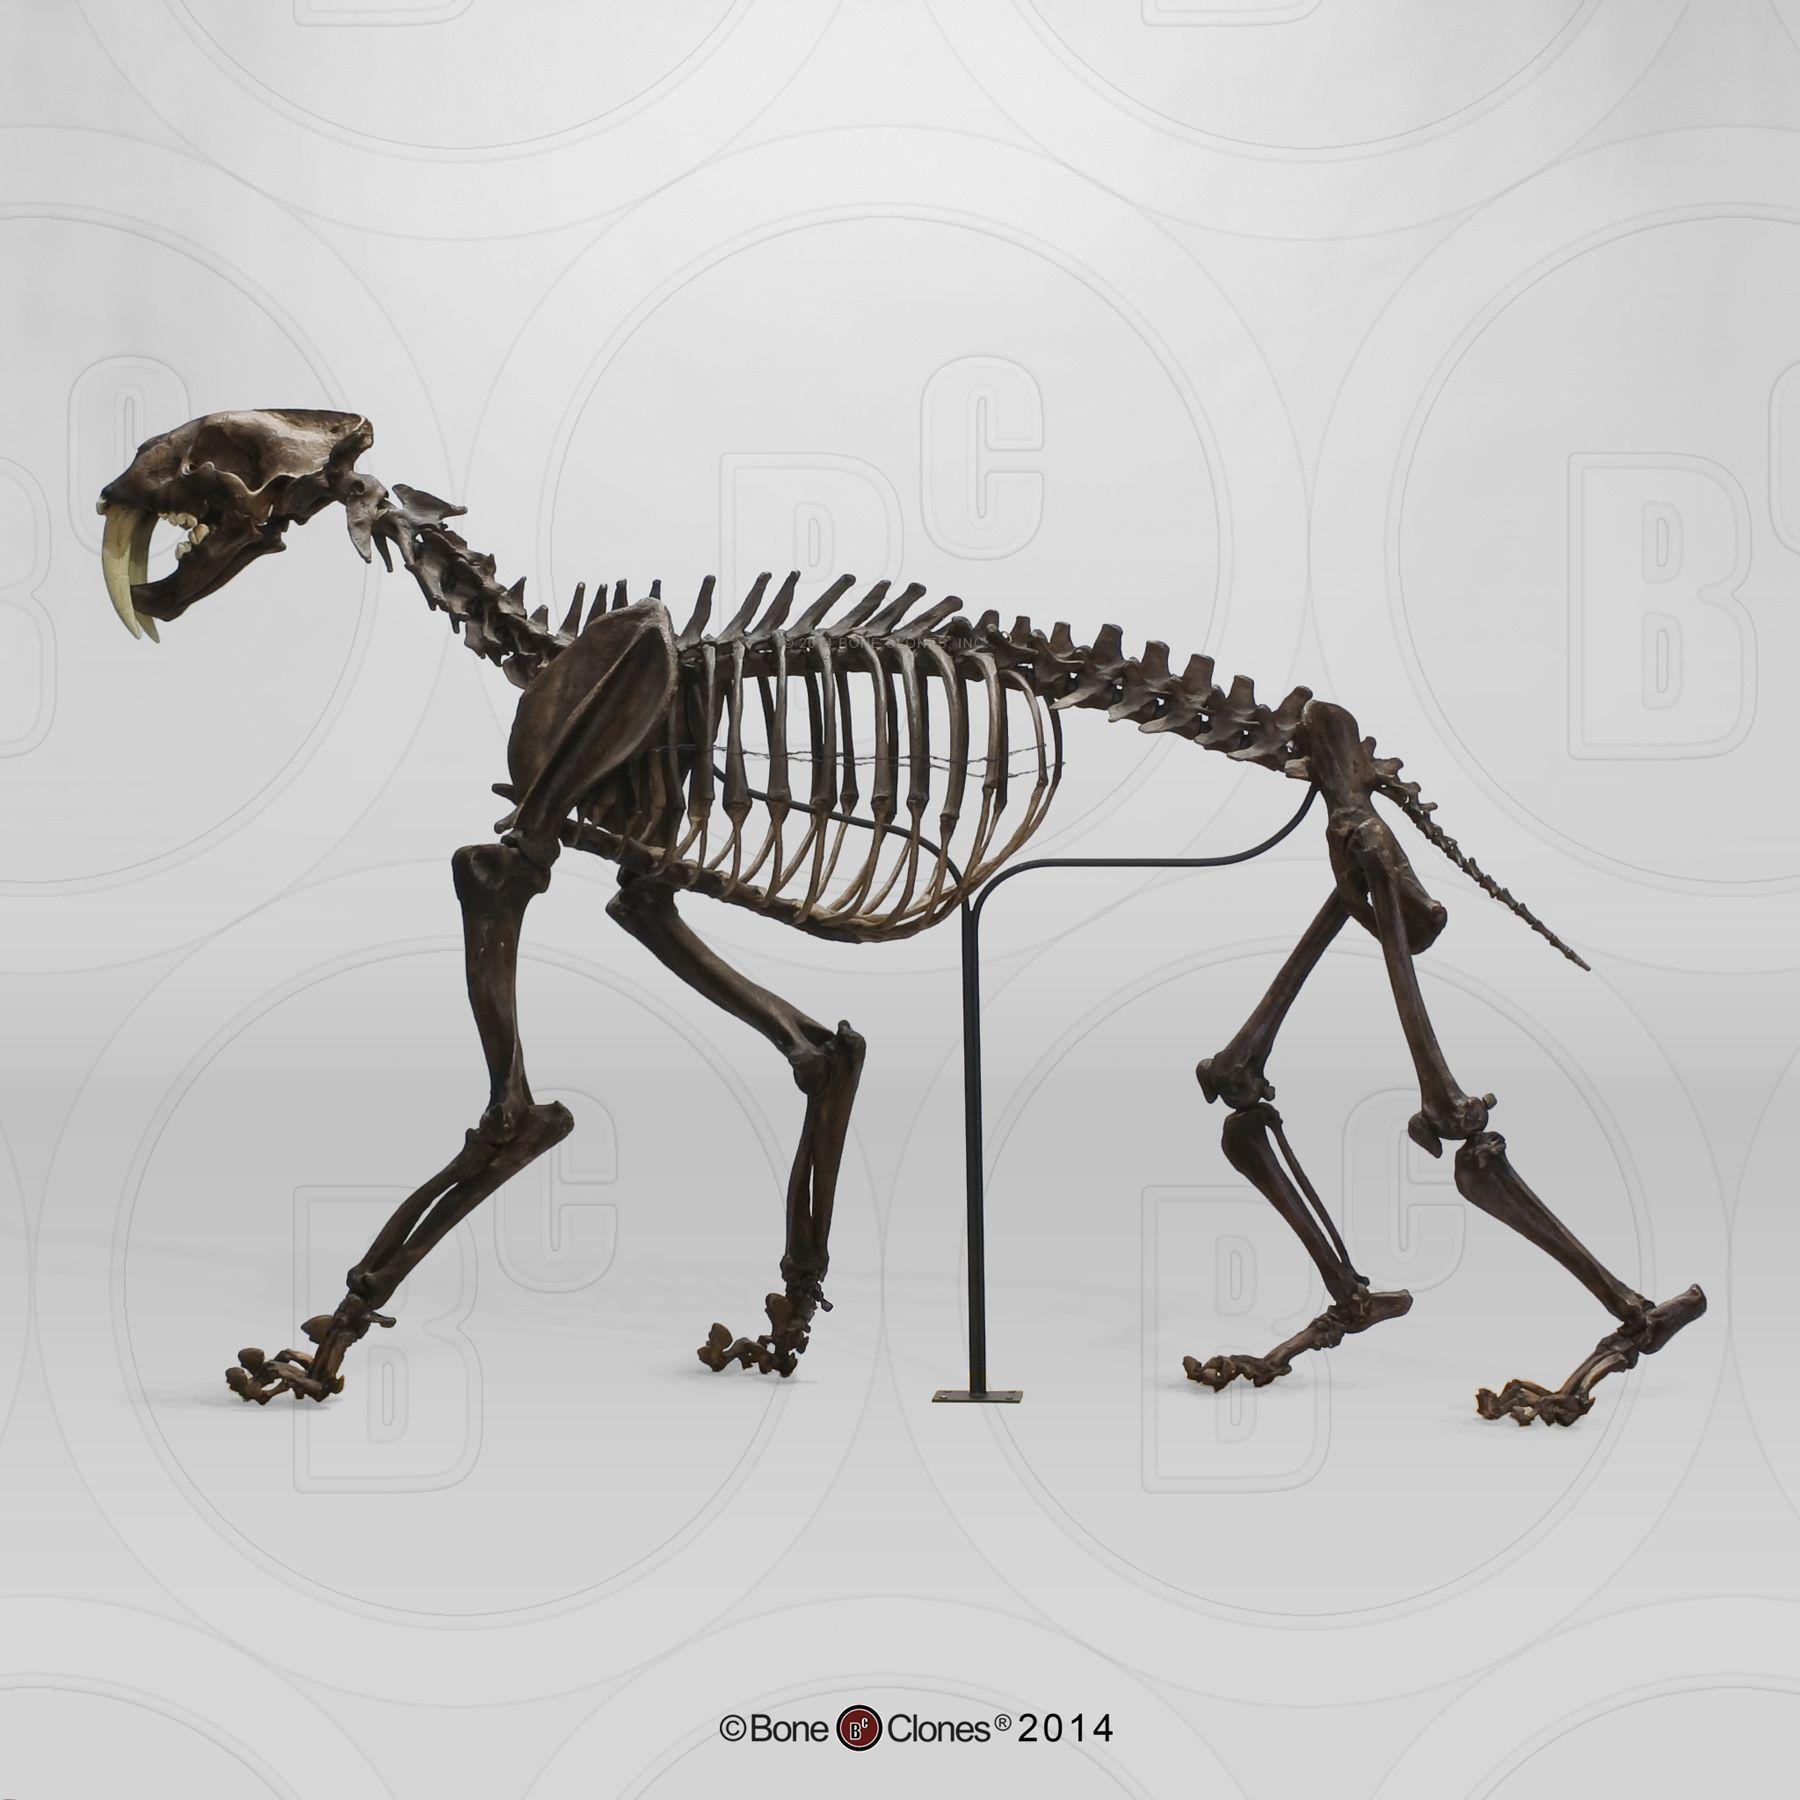 medium resolution of resultado de imagen de saber tooth tiger skull replica